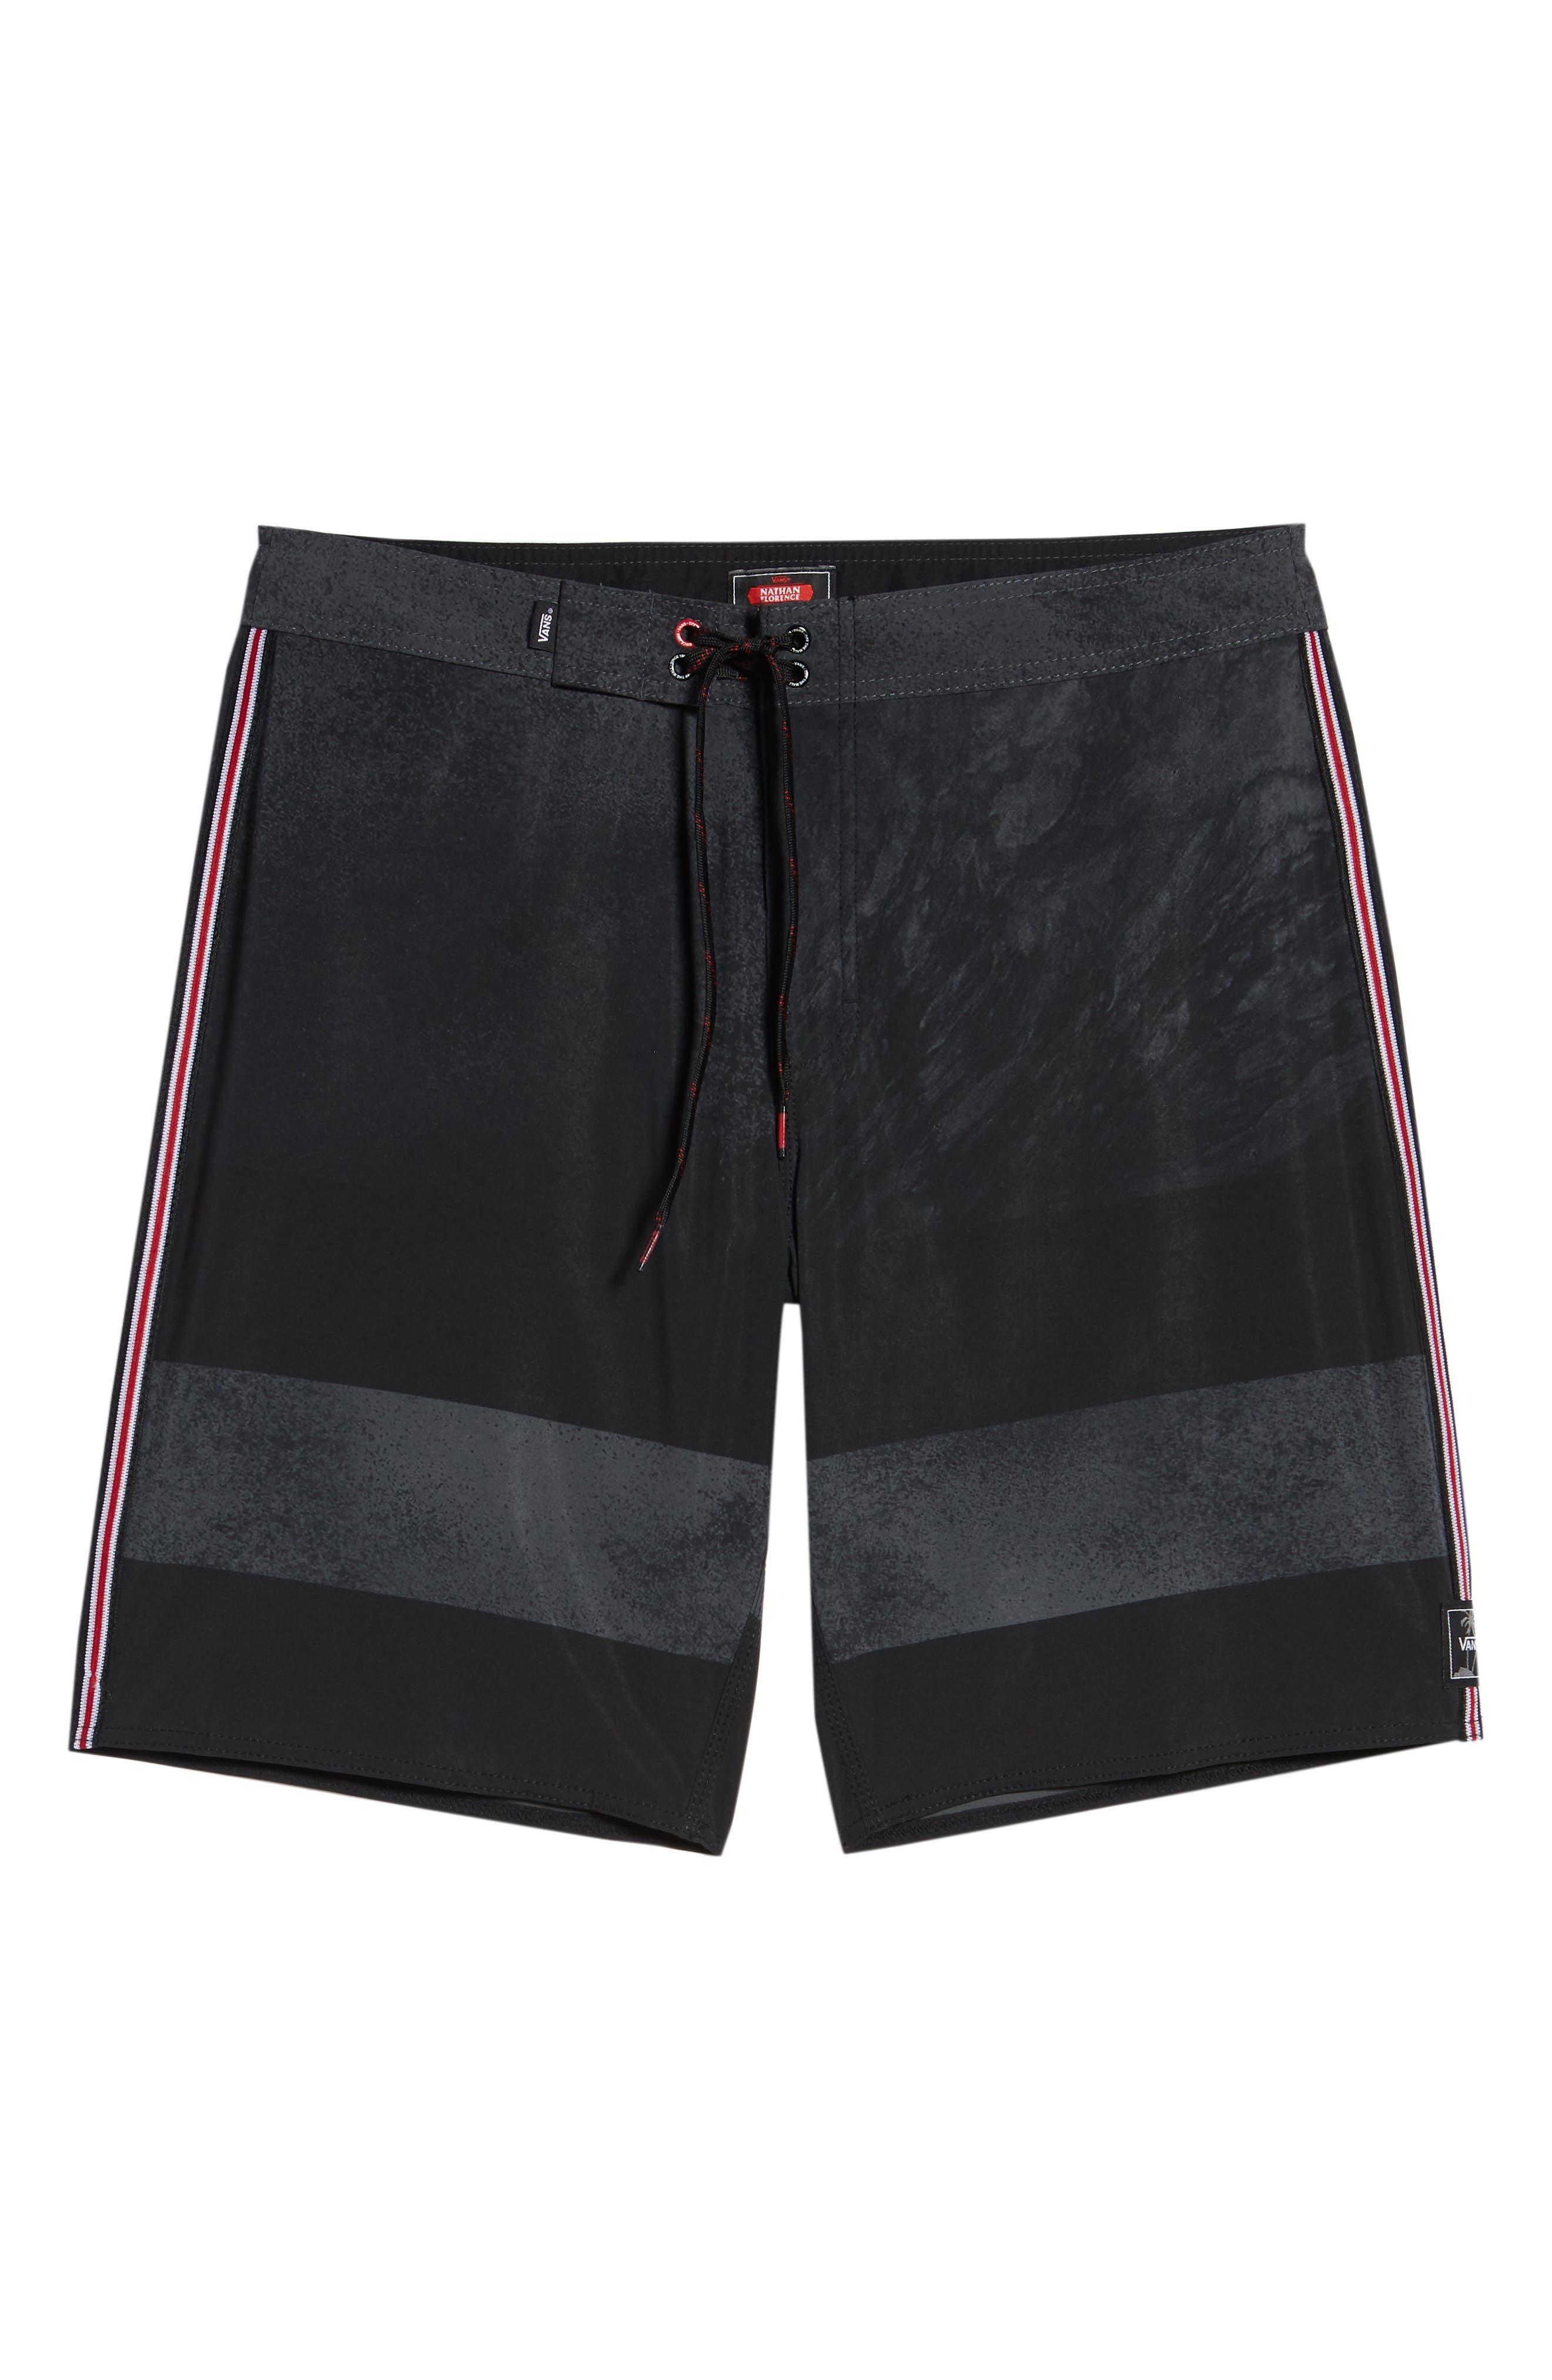 Era Board Shorts,                             Alternate thumbnail 6, color,                             001